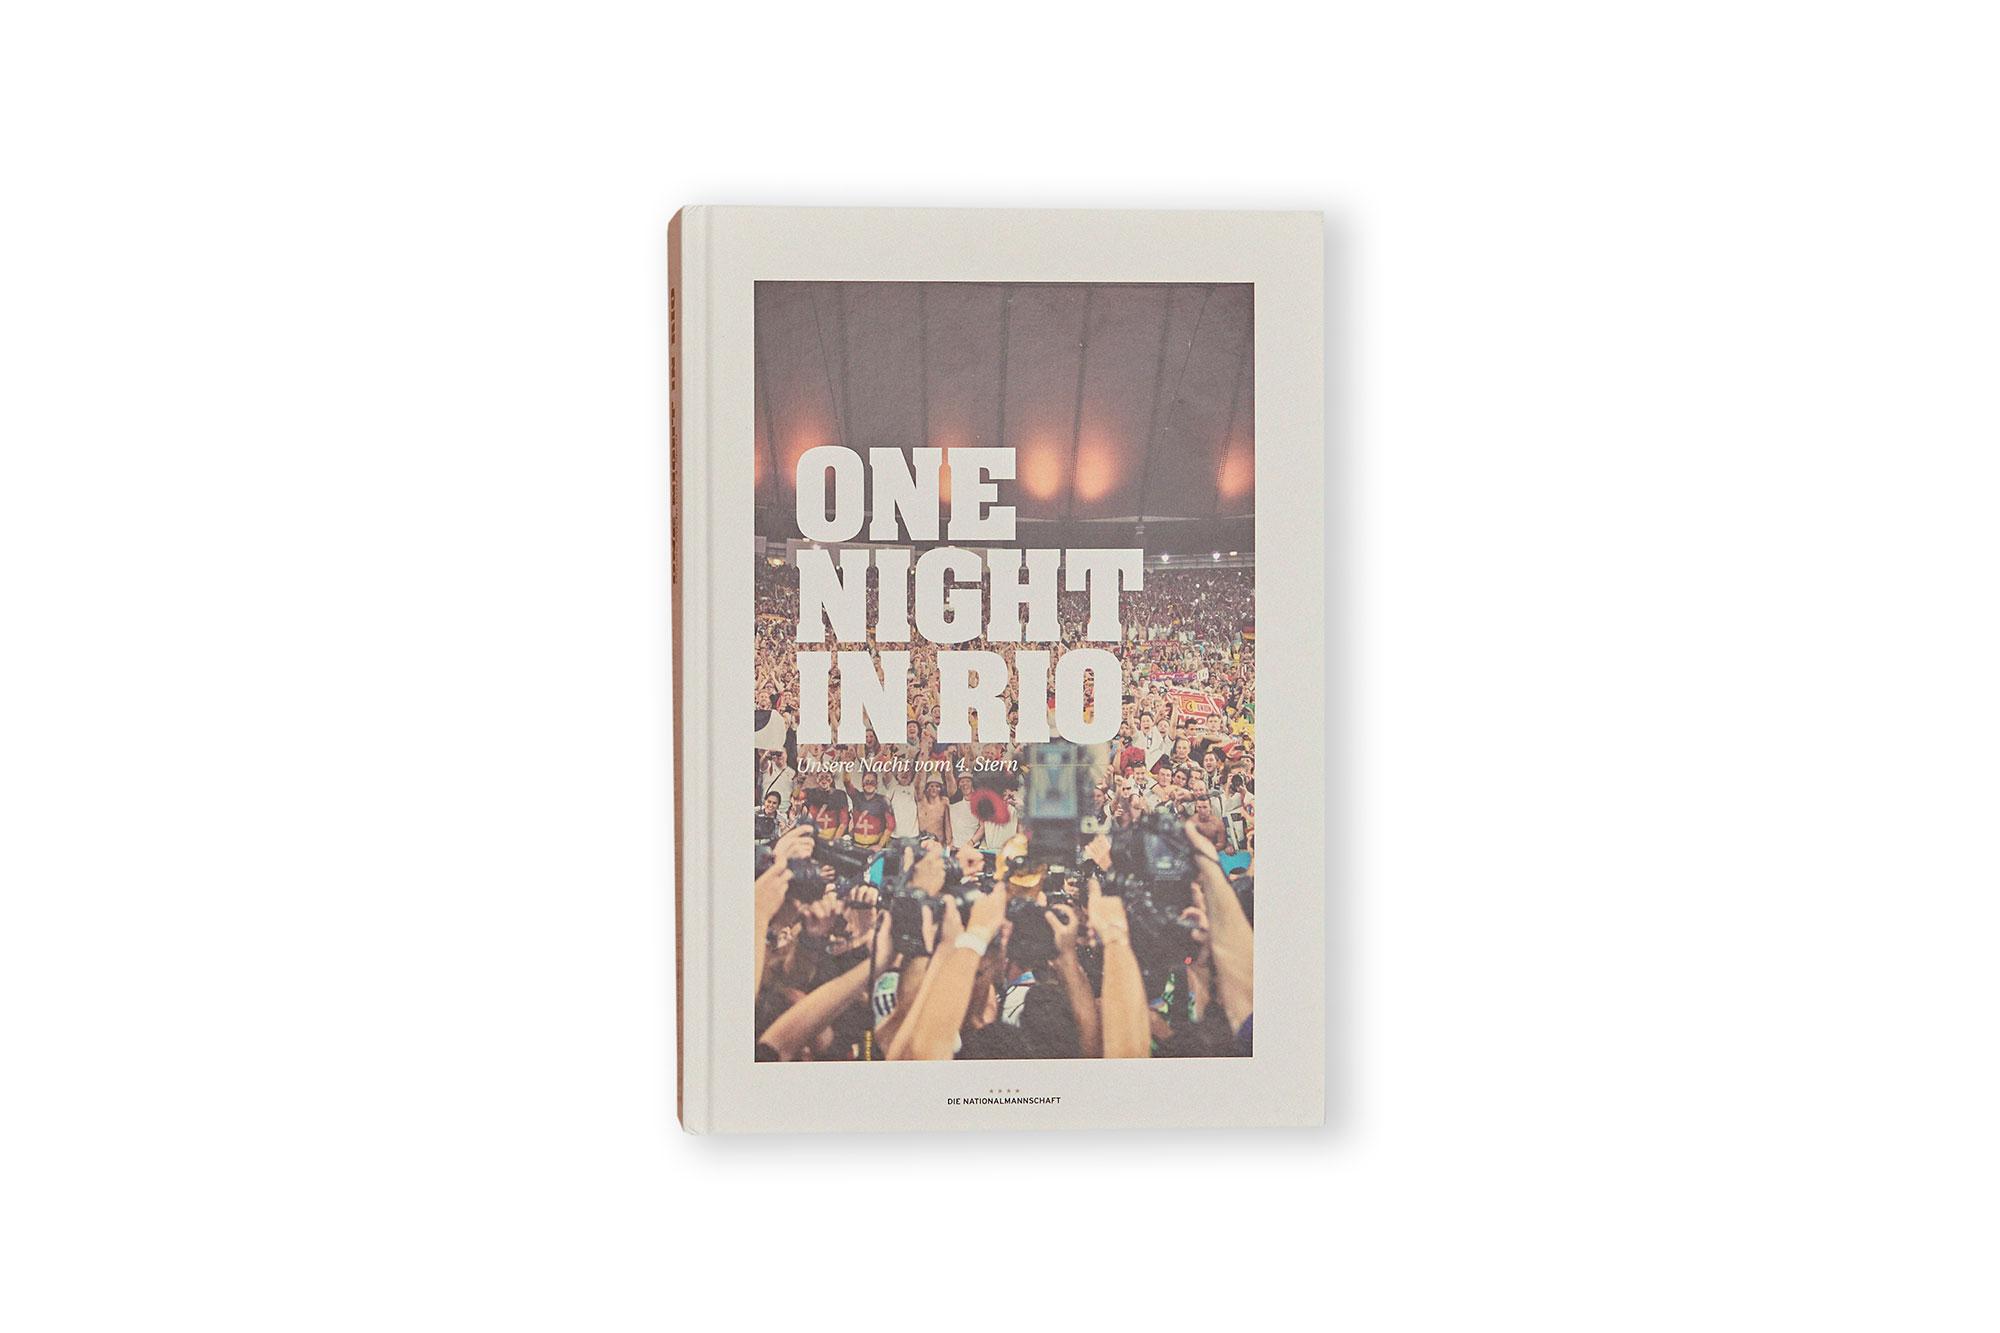 ONE NIGHT IN RIO, paul ripke.